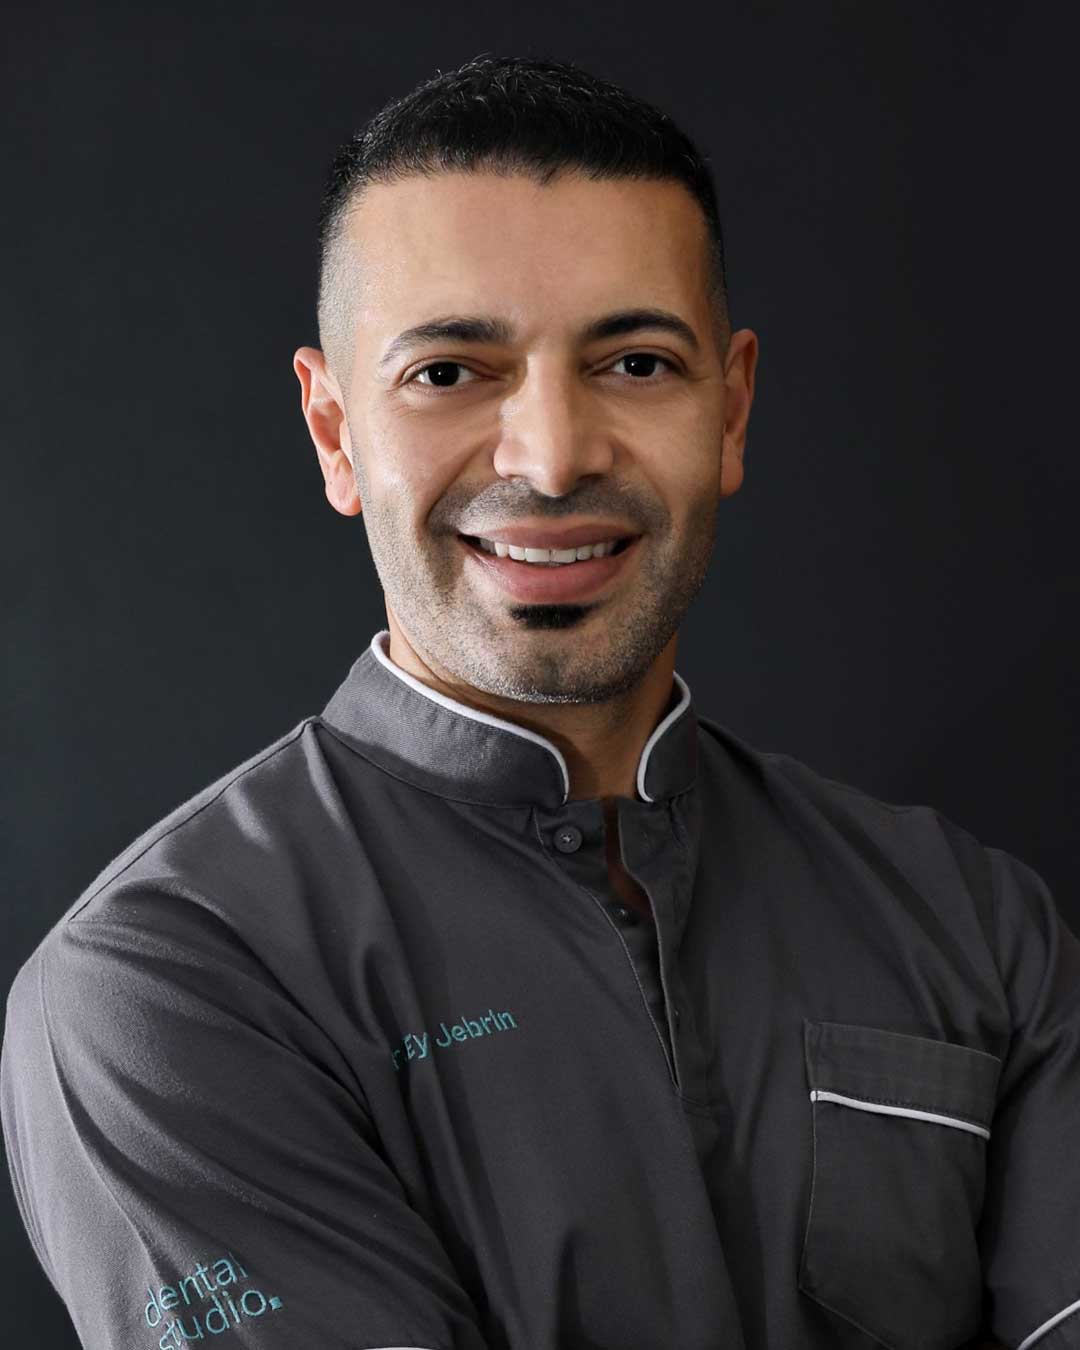 Periodontist Dr. Eyass Jebrin